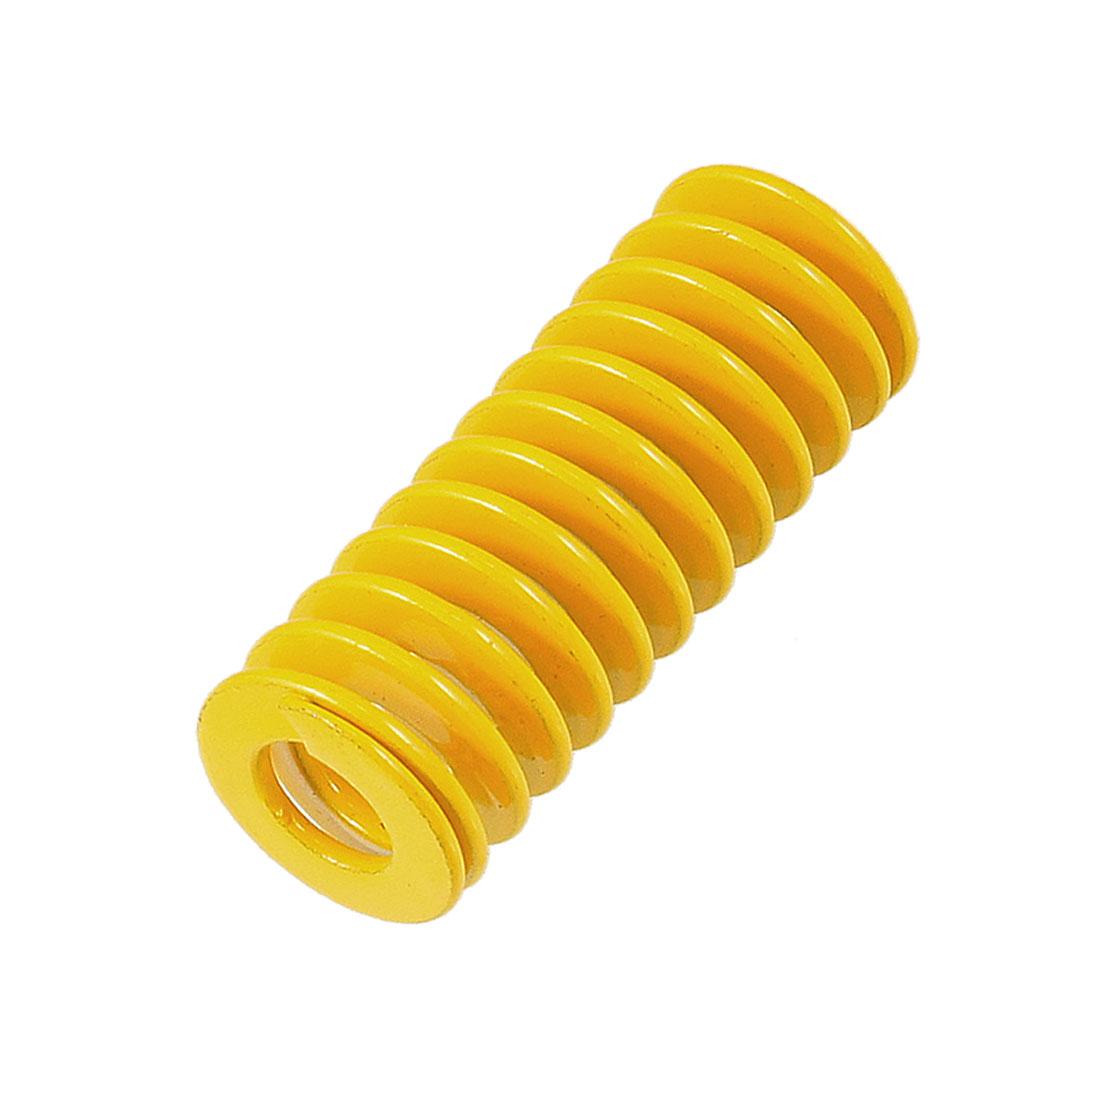 Orange 18mm x 9mm x 45mm Metal Tubular Section Mould Die Spring